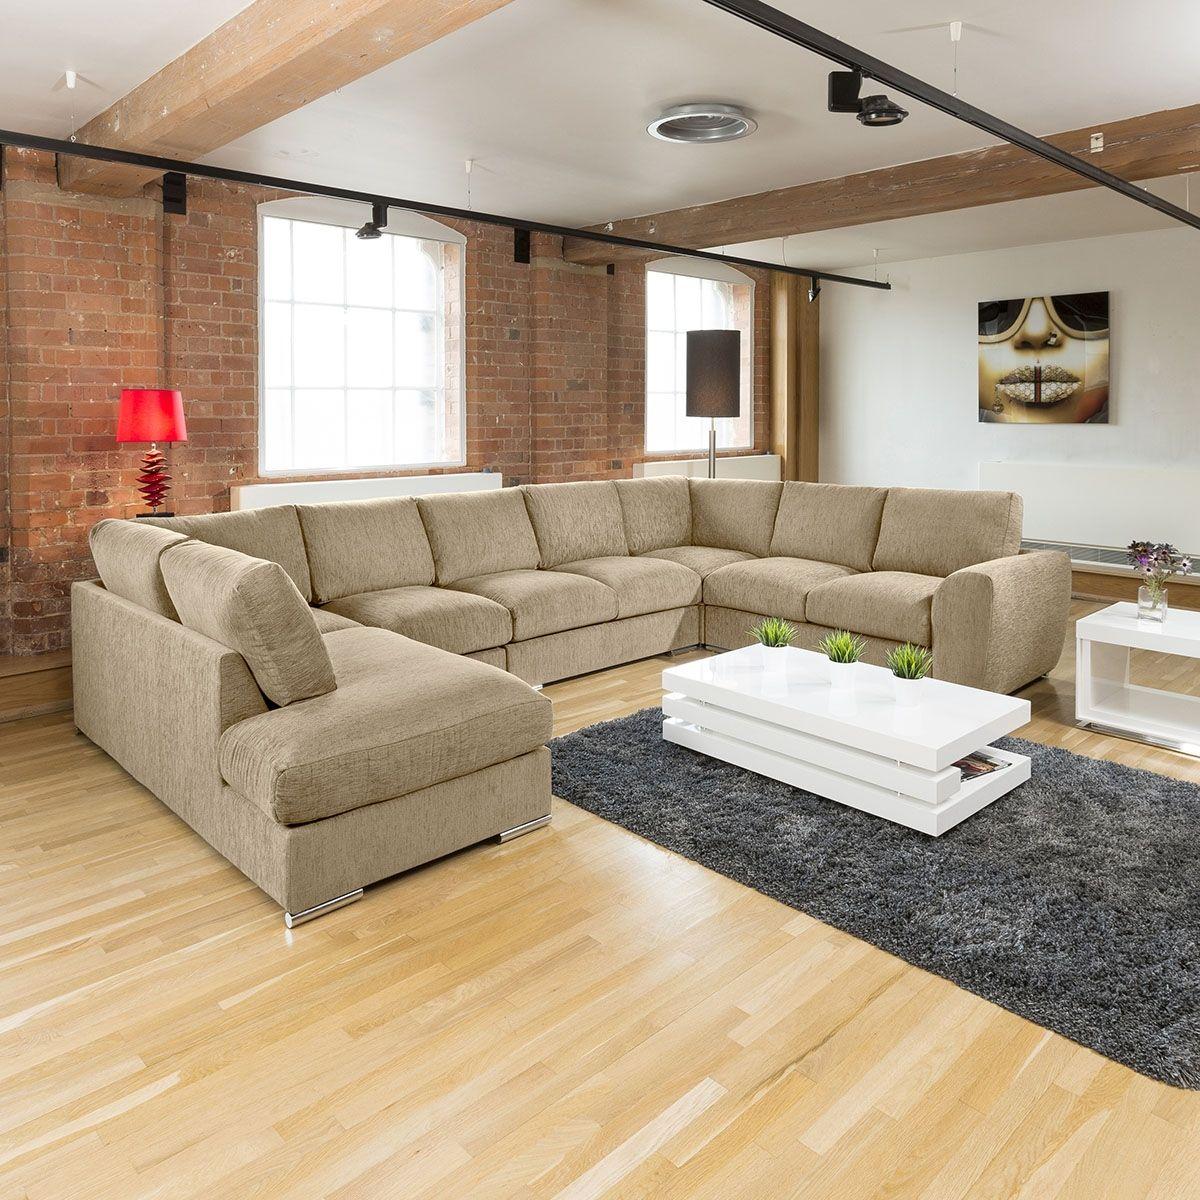 Extra Large Sofa Set Settee Corner Group U L Shape Cream 4 0 X 2 6m R Extra Large Corner Sofas Large Sofa Sofa Set